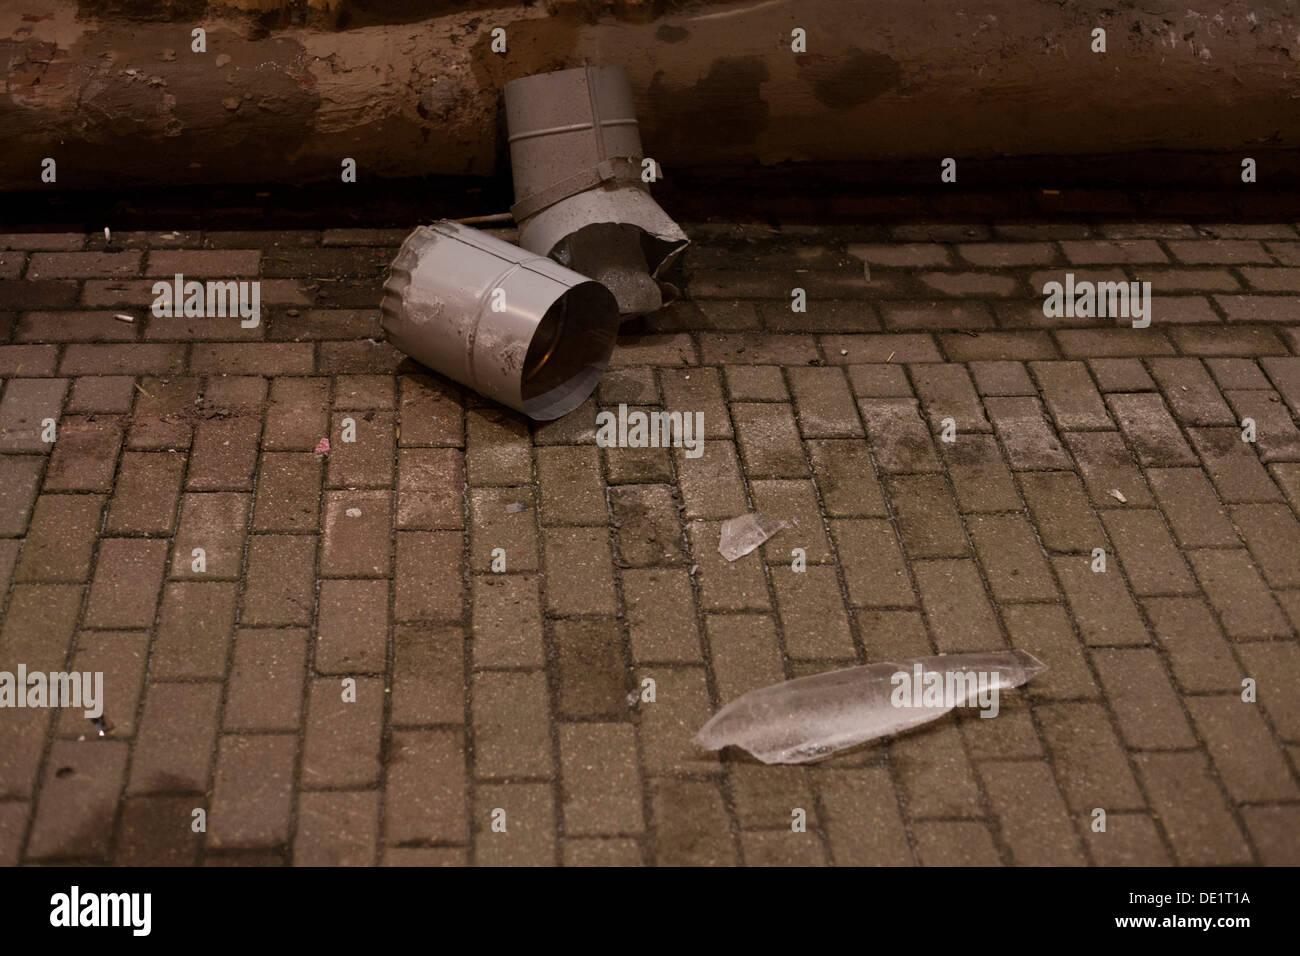 broken drainpipe, MInsk - Stock Image